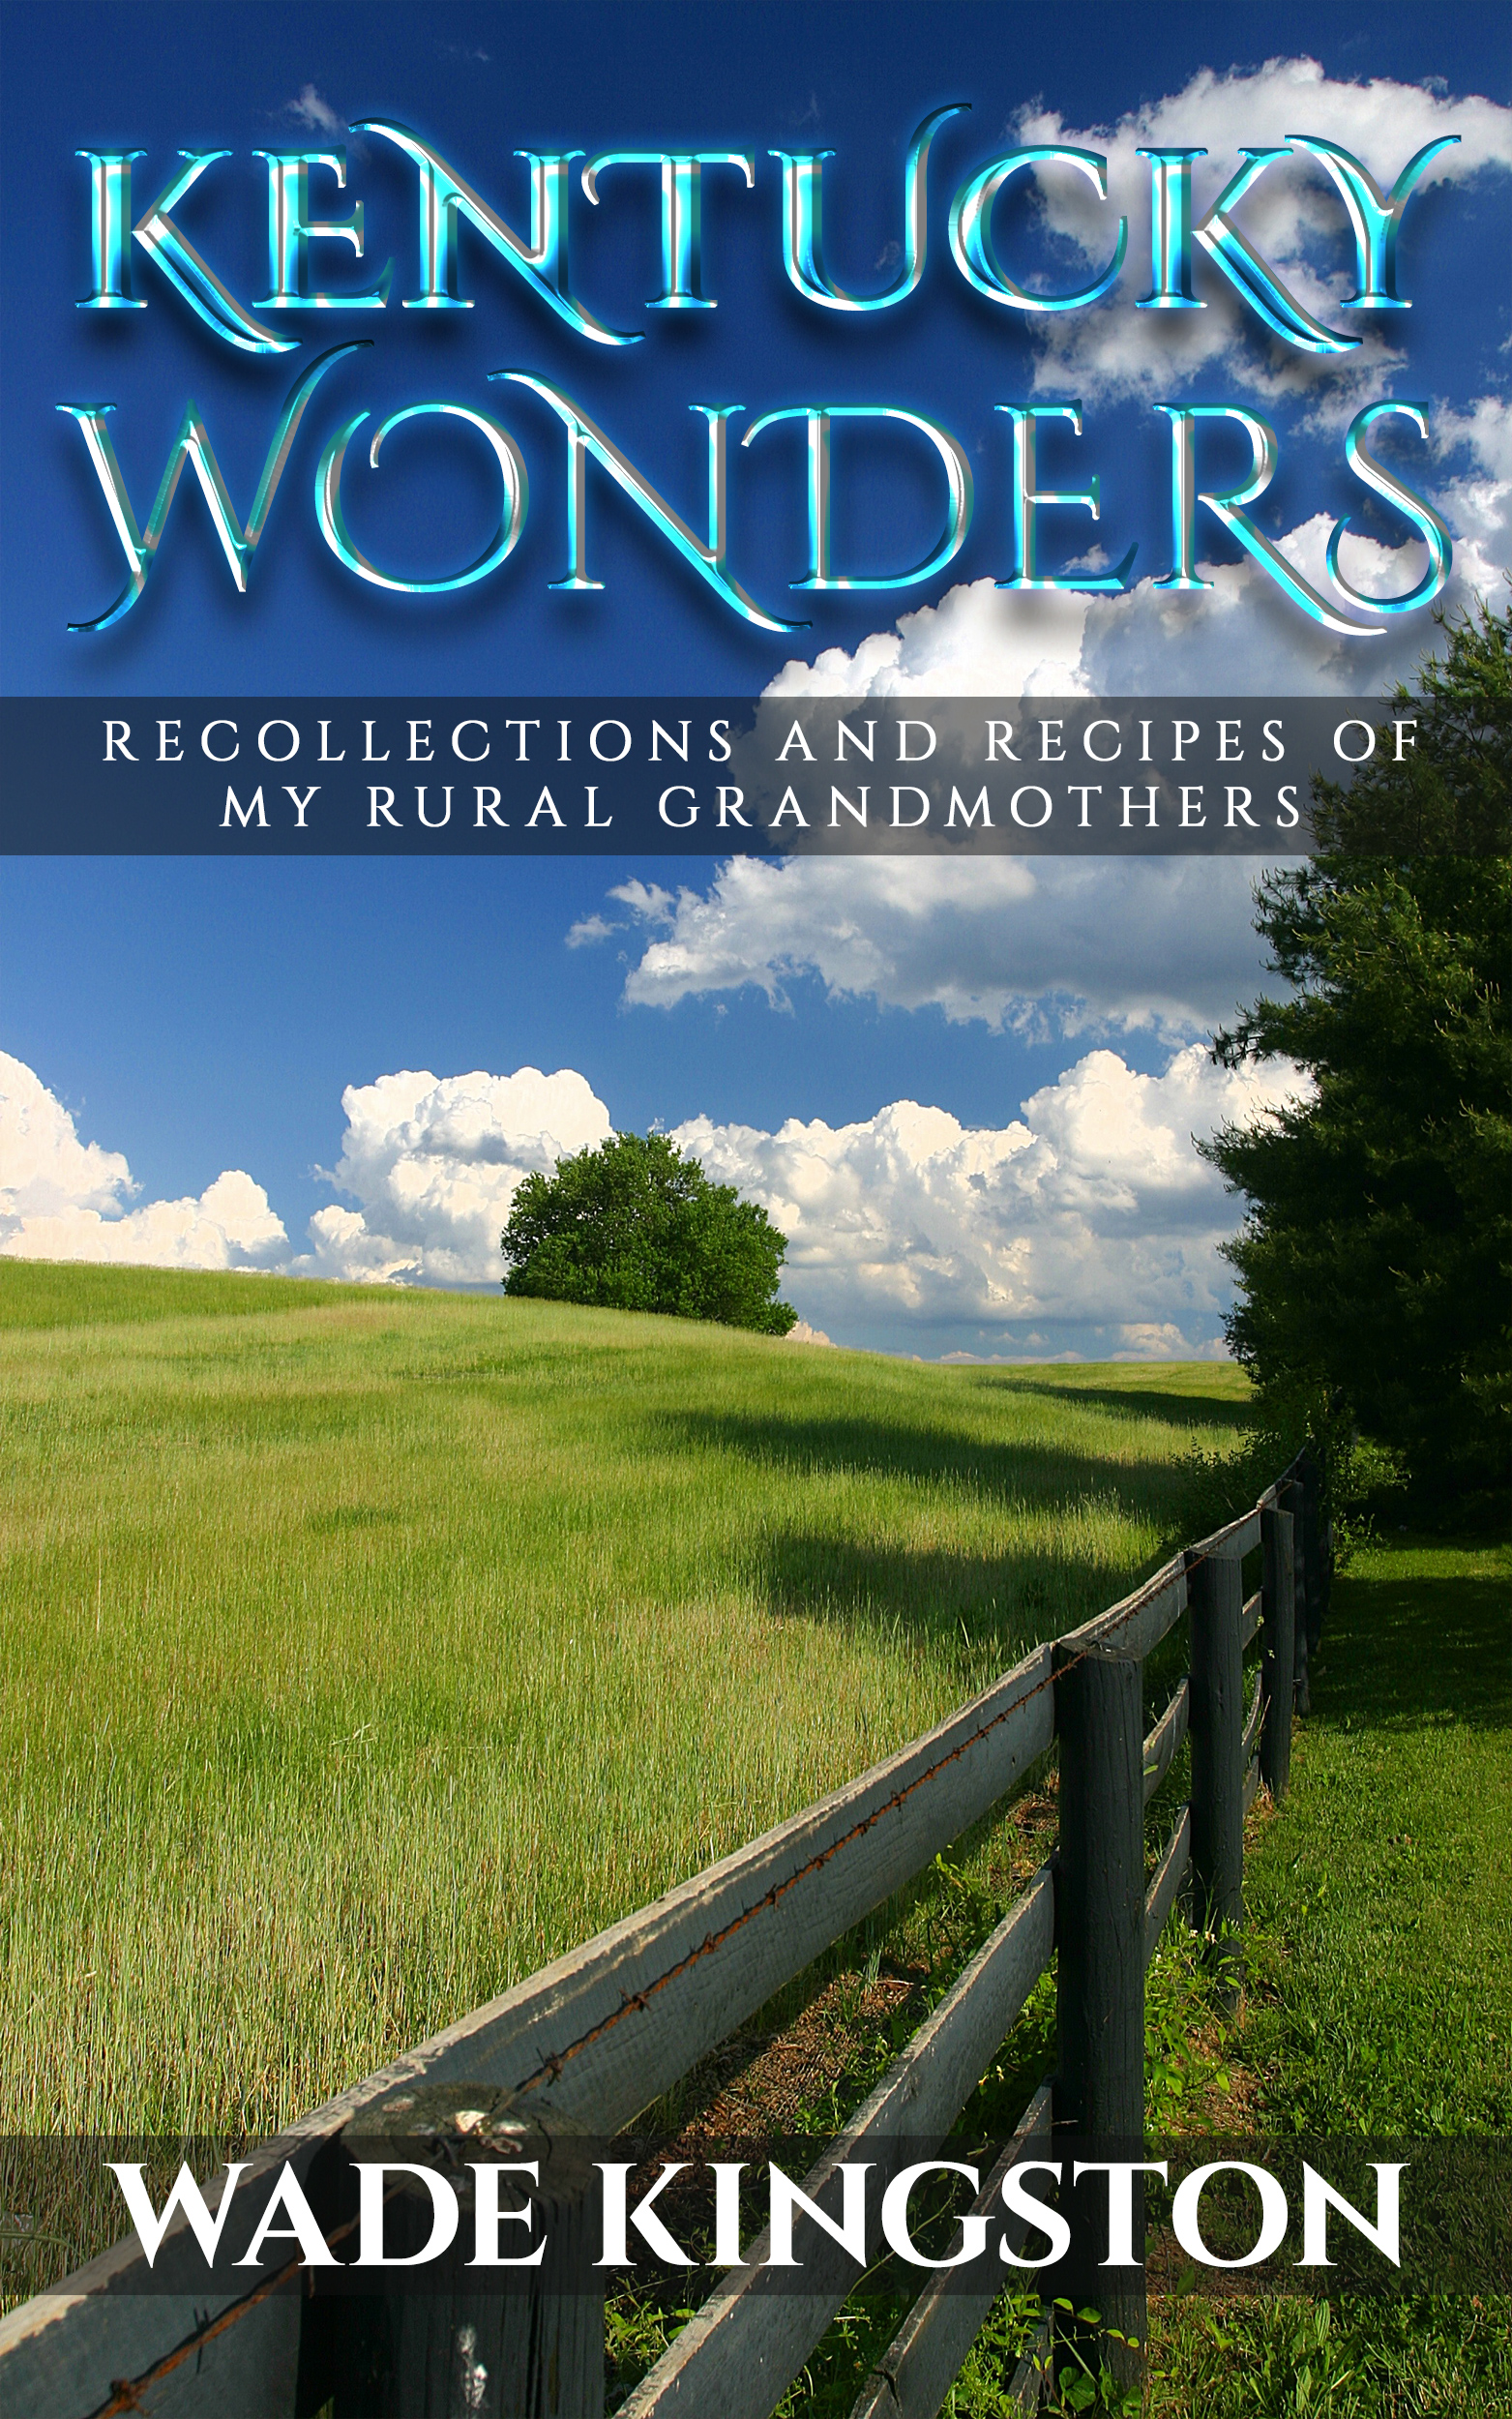 Kentucky Wonders